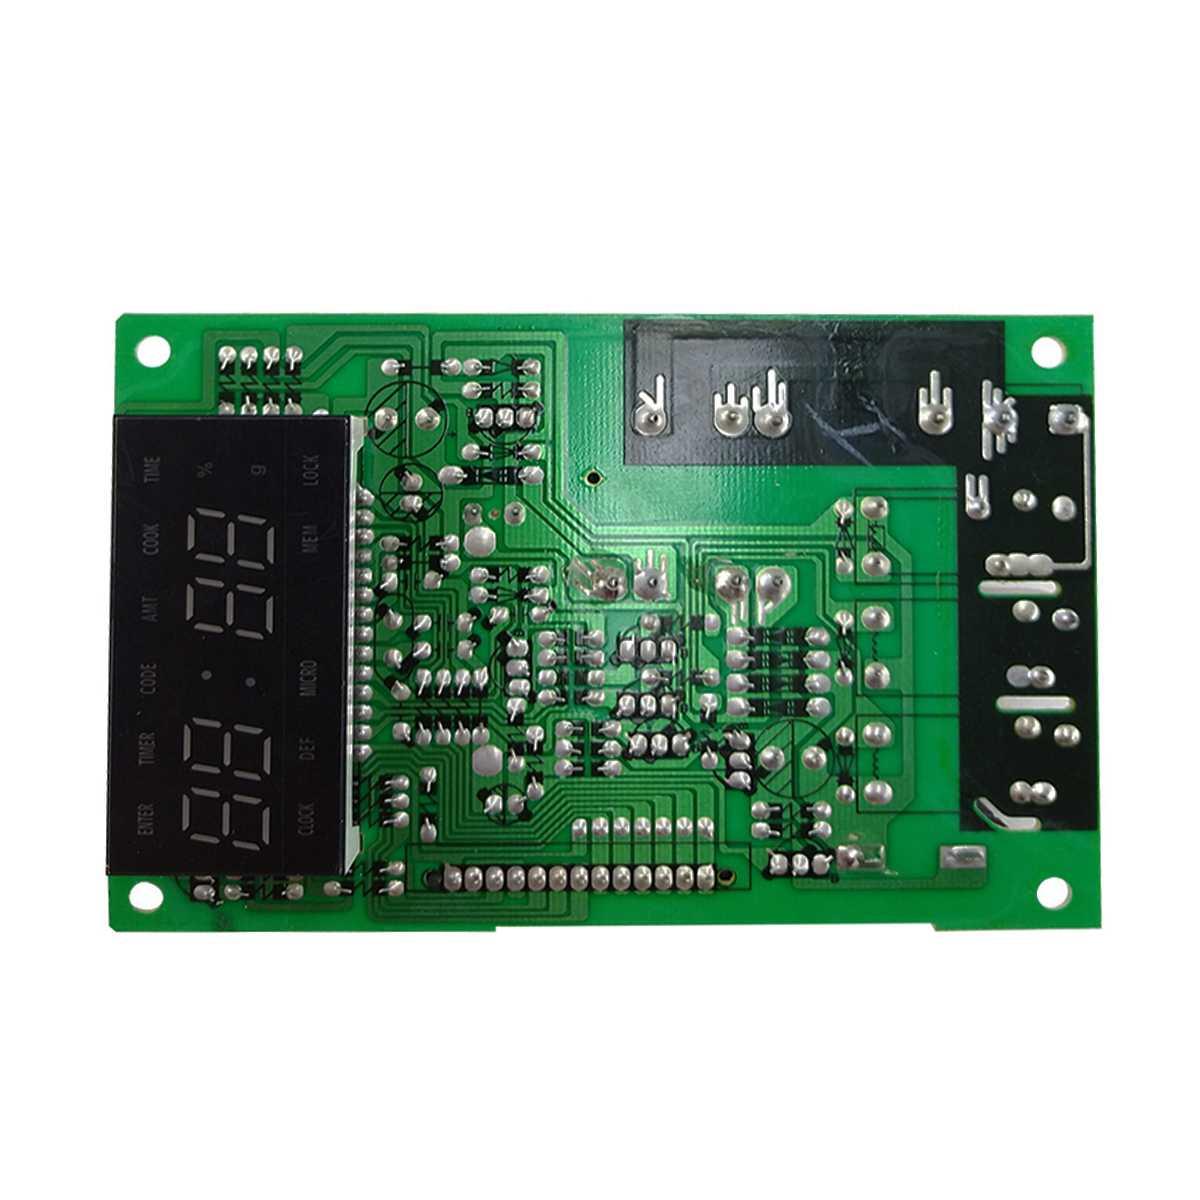 Placa eletrônica micro-ondas Brastemp & Consul 220V W10187216 BMS25AB , BMY25AR, CMS25AB